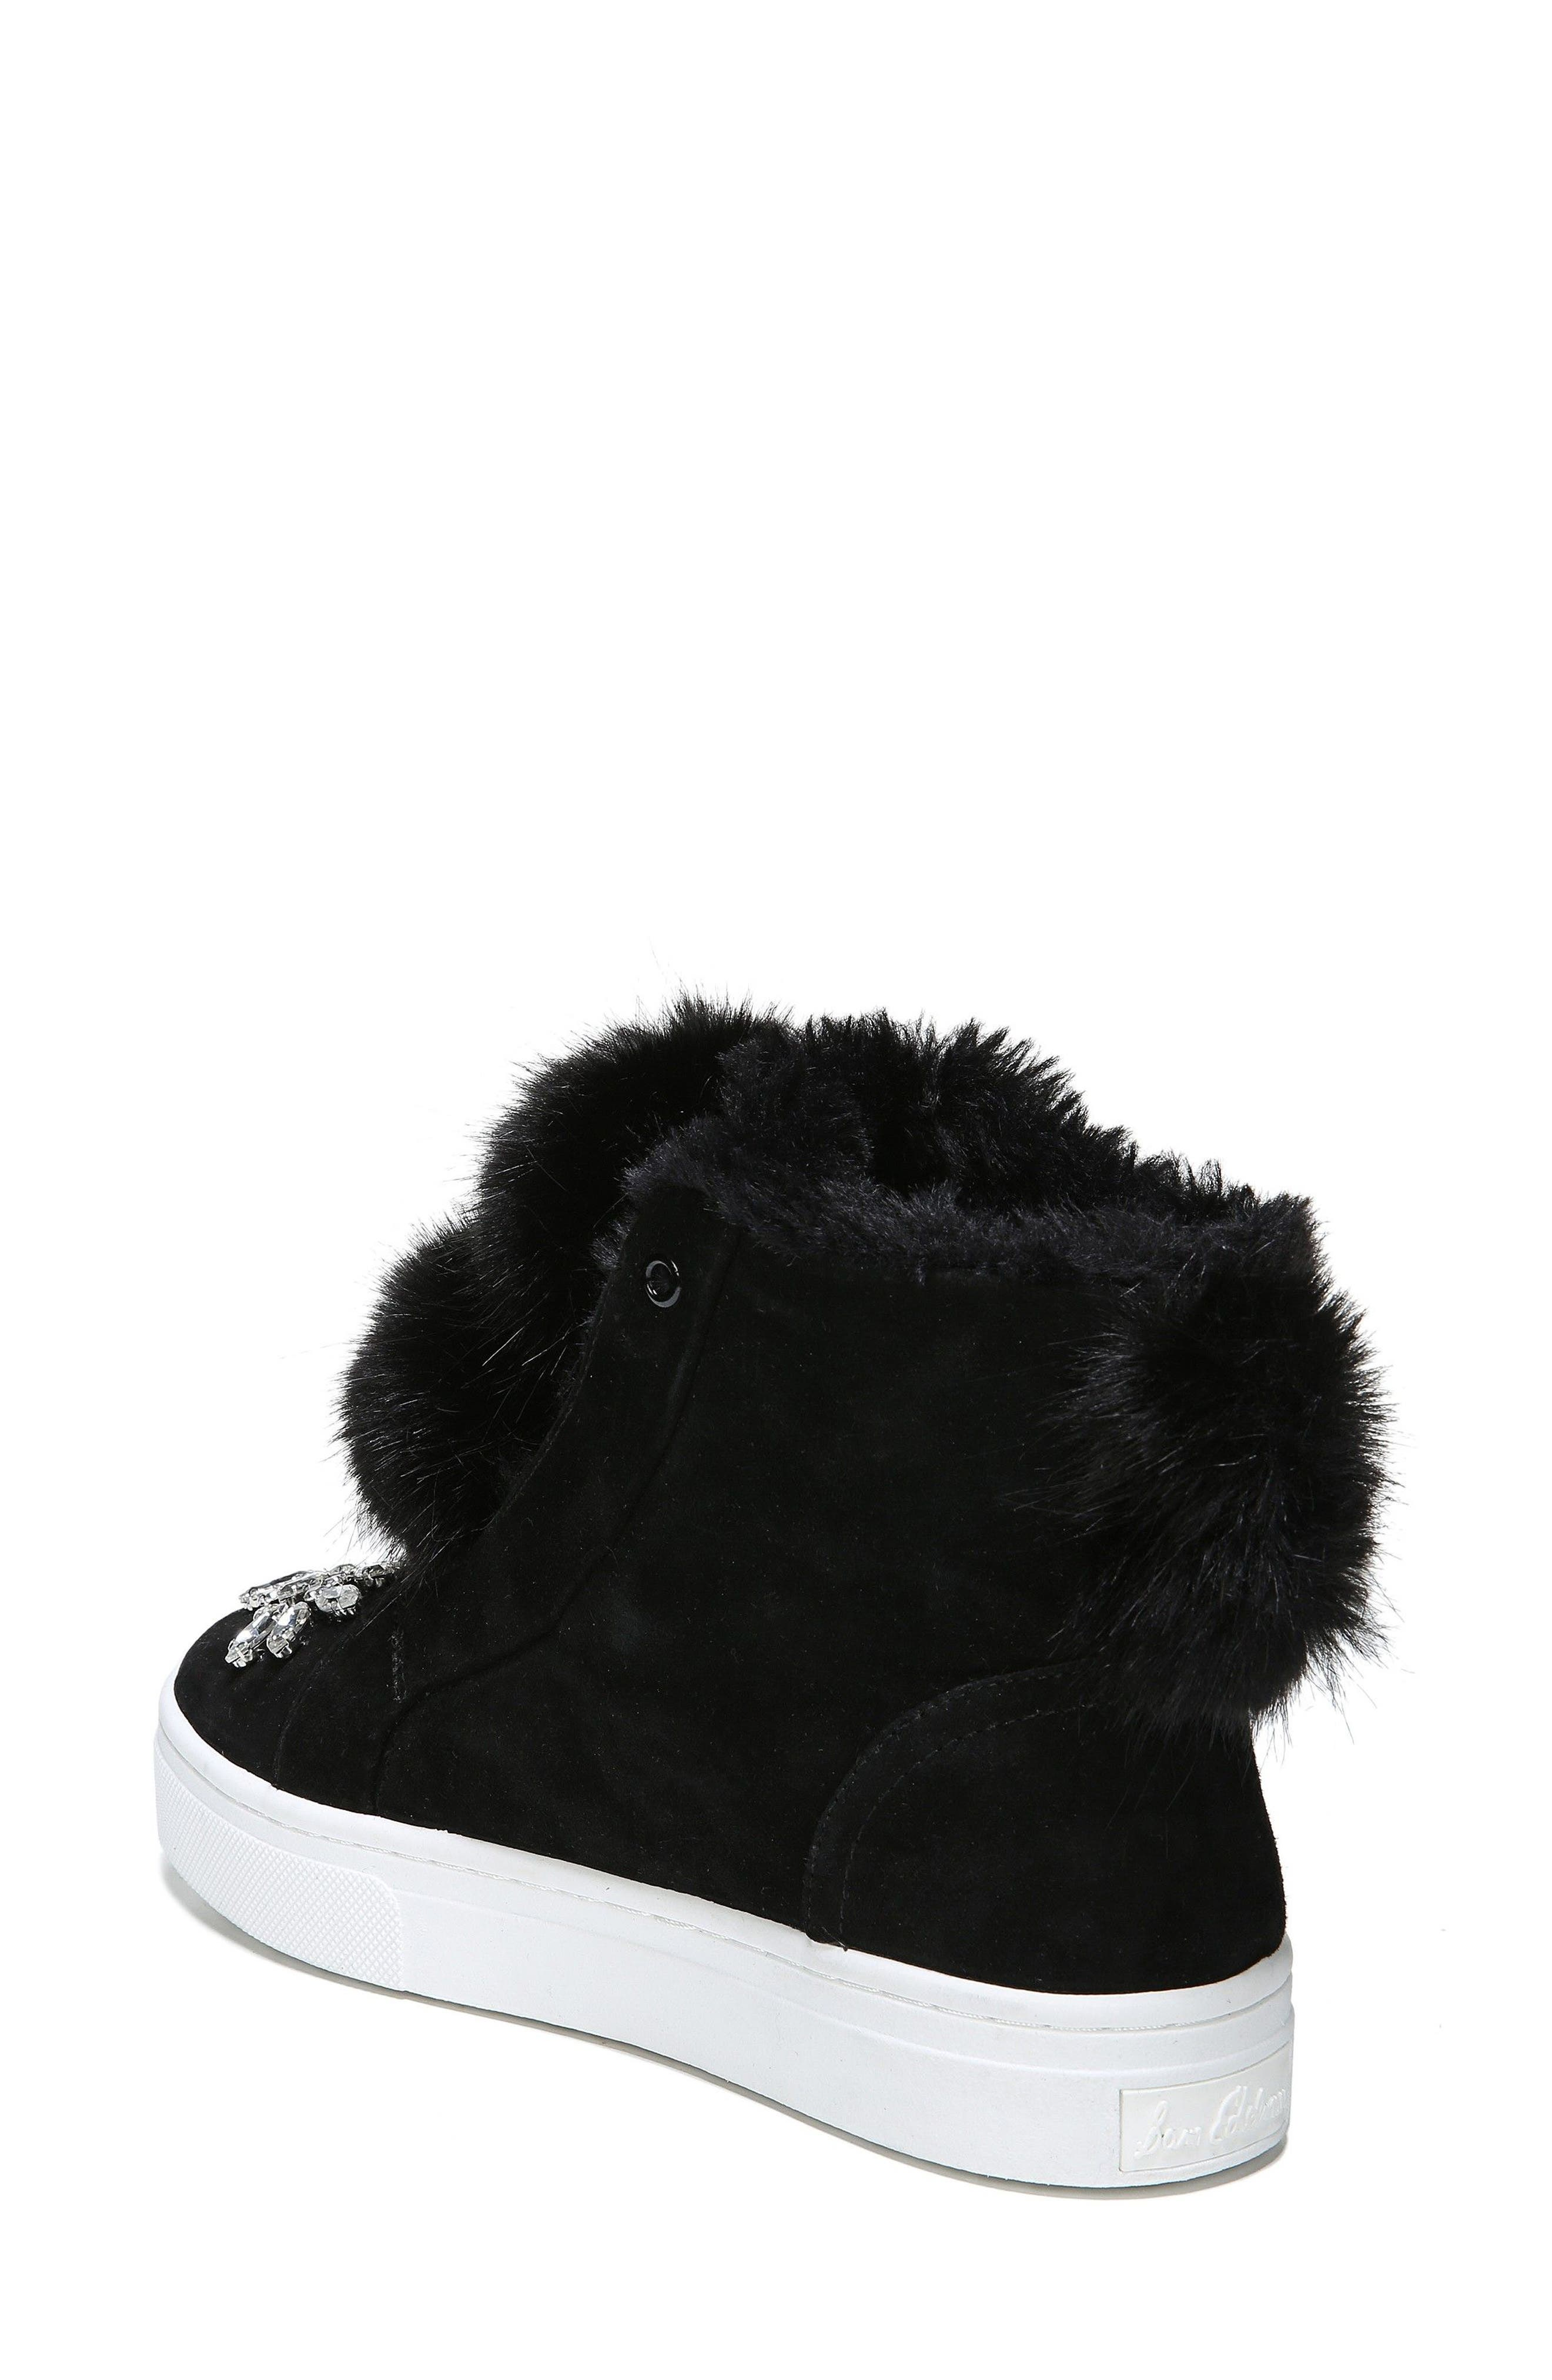 Leland Faux Fur Sneaker,                             Alternate thumbnail 2, color,                             001